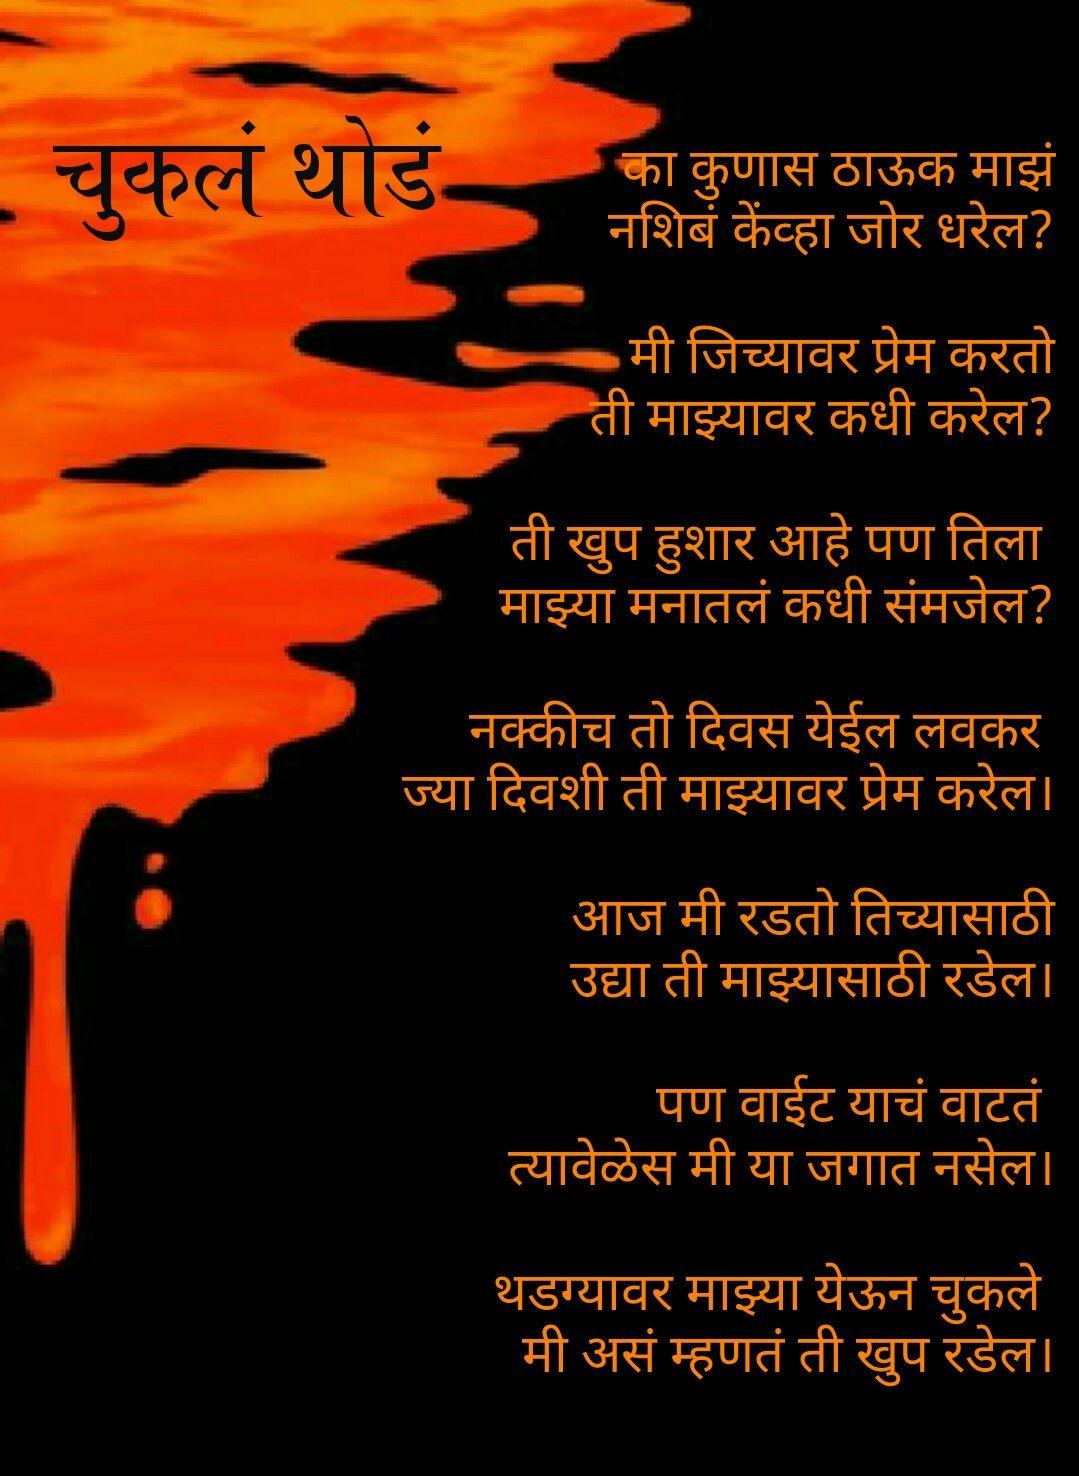 चुकलंच थोडं ,,, (With images) Marathi poems, Love poems